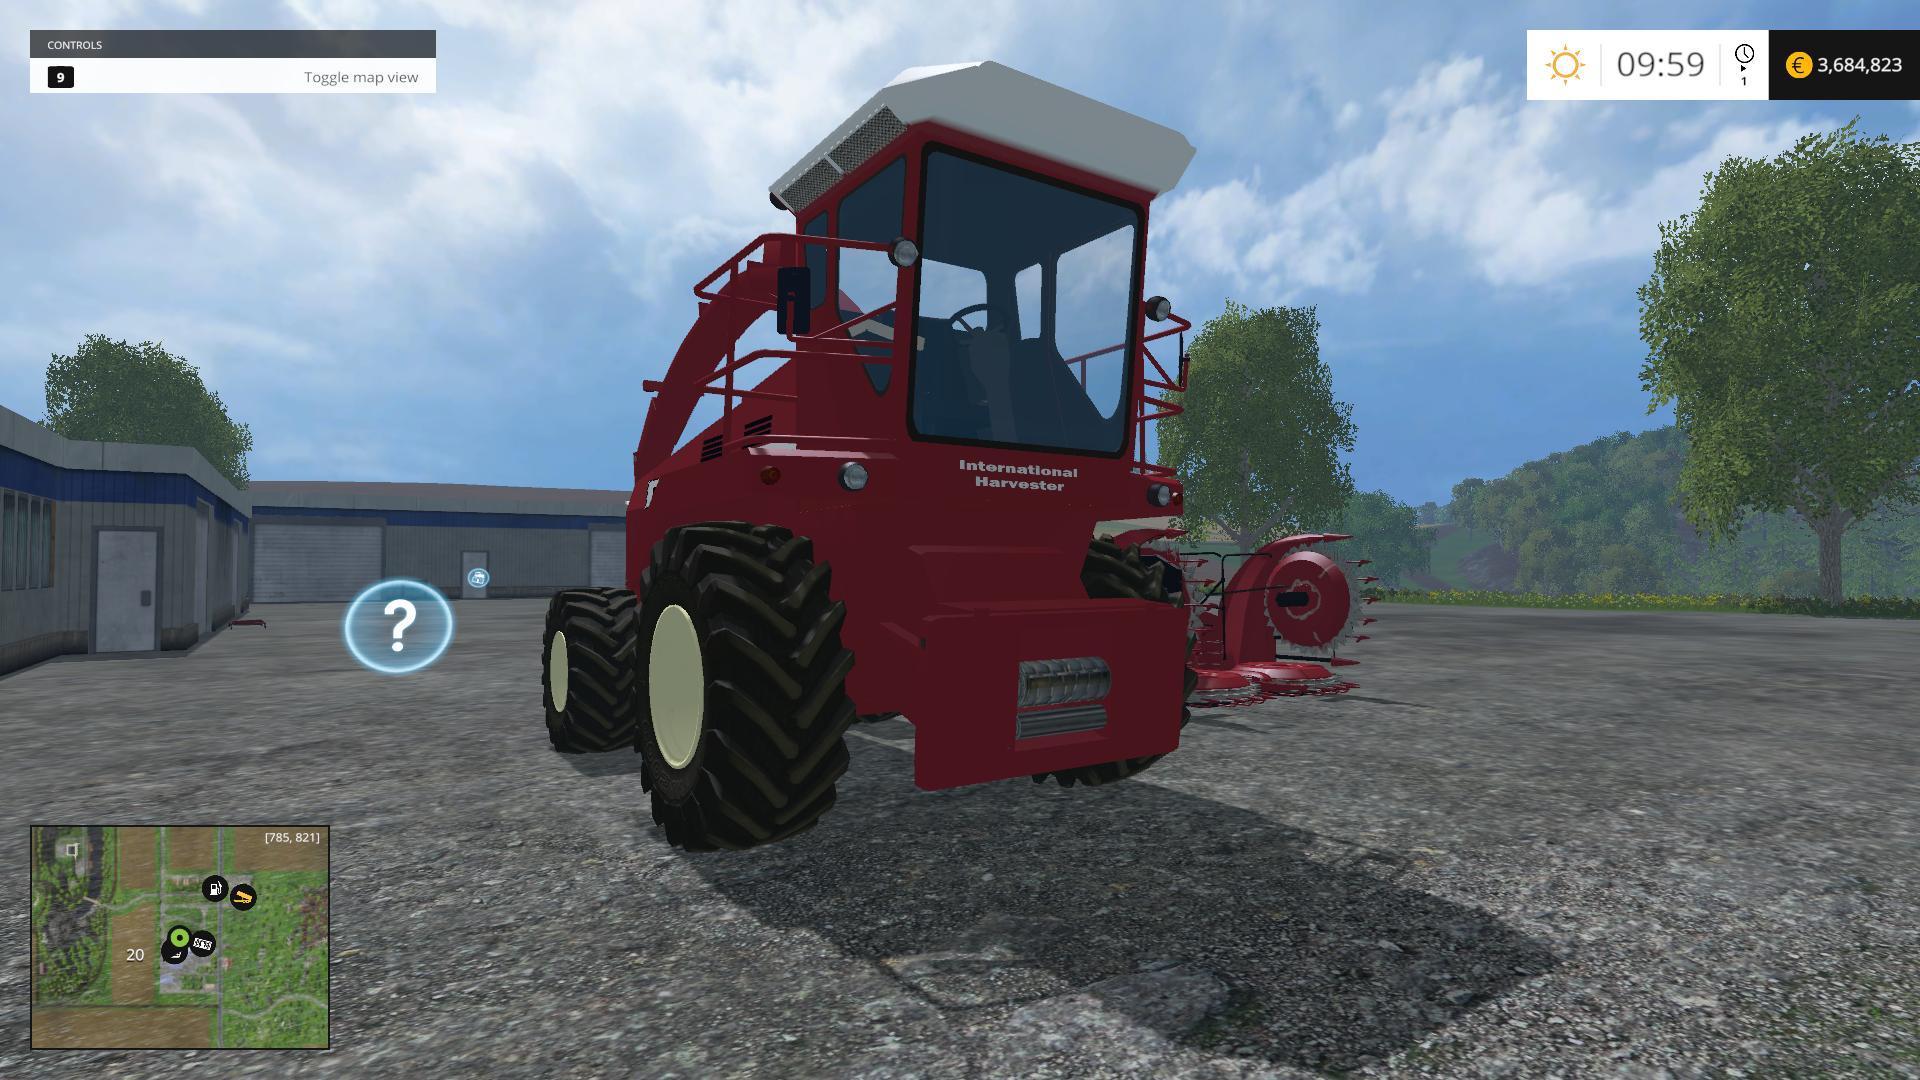 FS 15 Combines - Farming simulator 19, 17, 15 mods | FS19